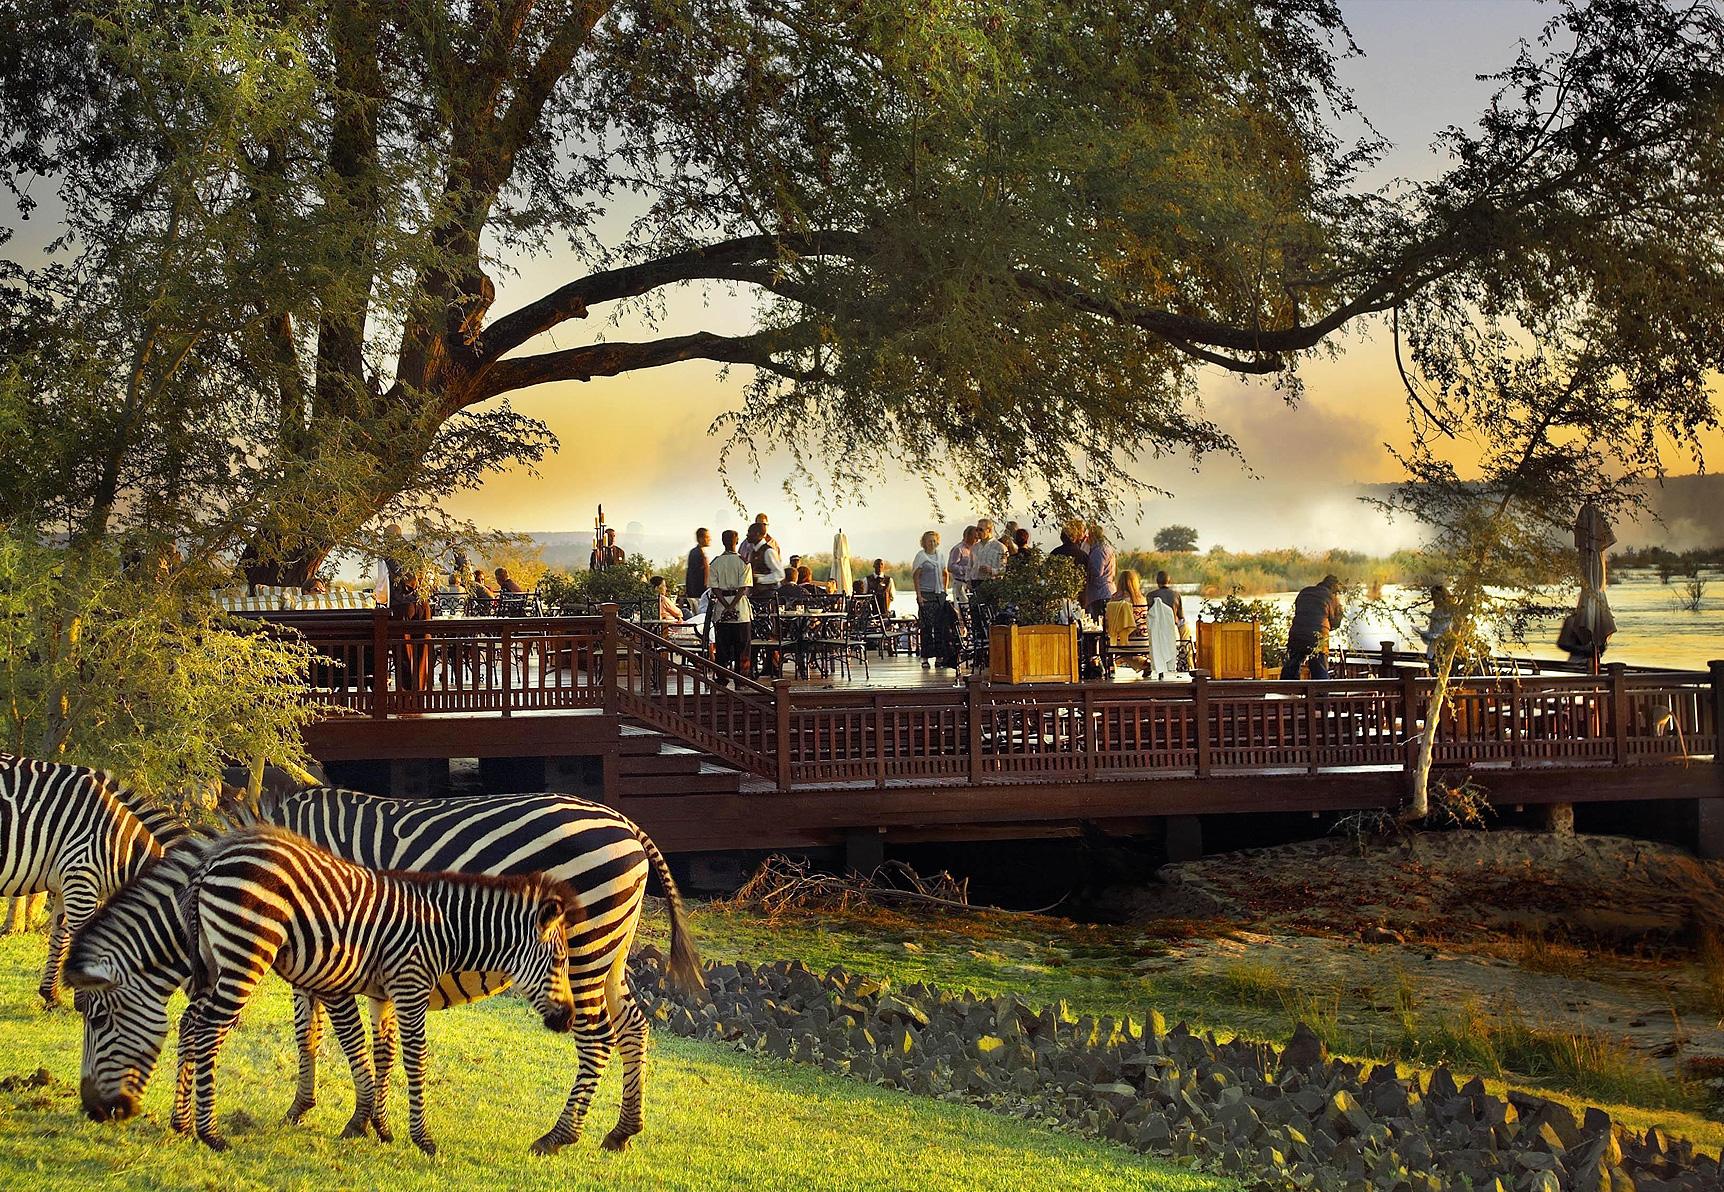 Vic Falls: Zimbabwe or Zambia? inline image 5bf3c35179d35